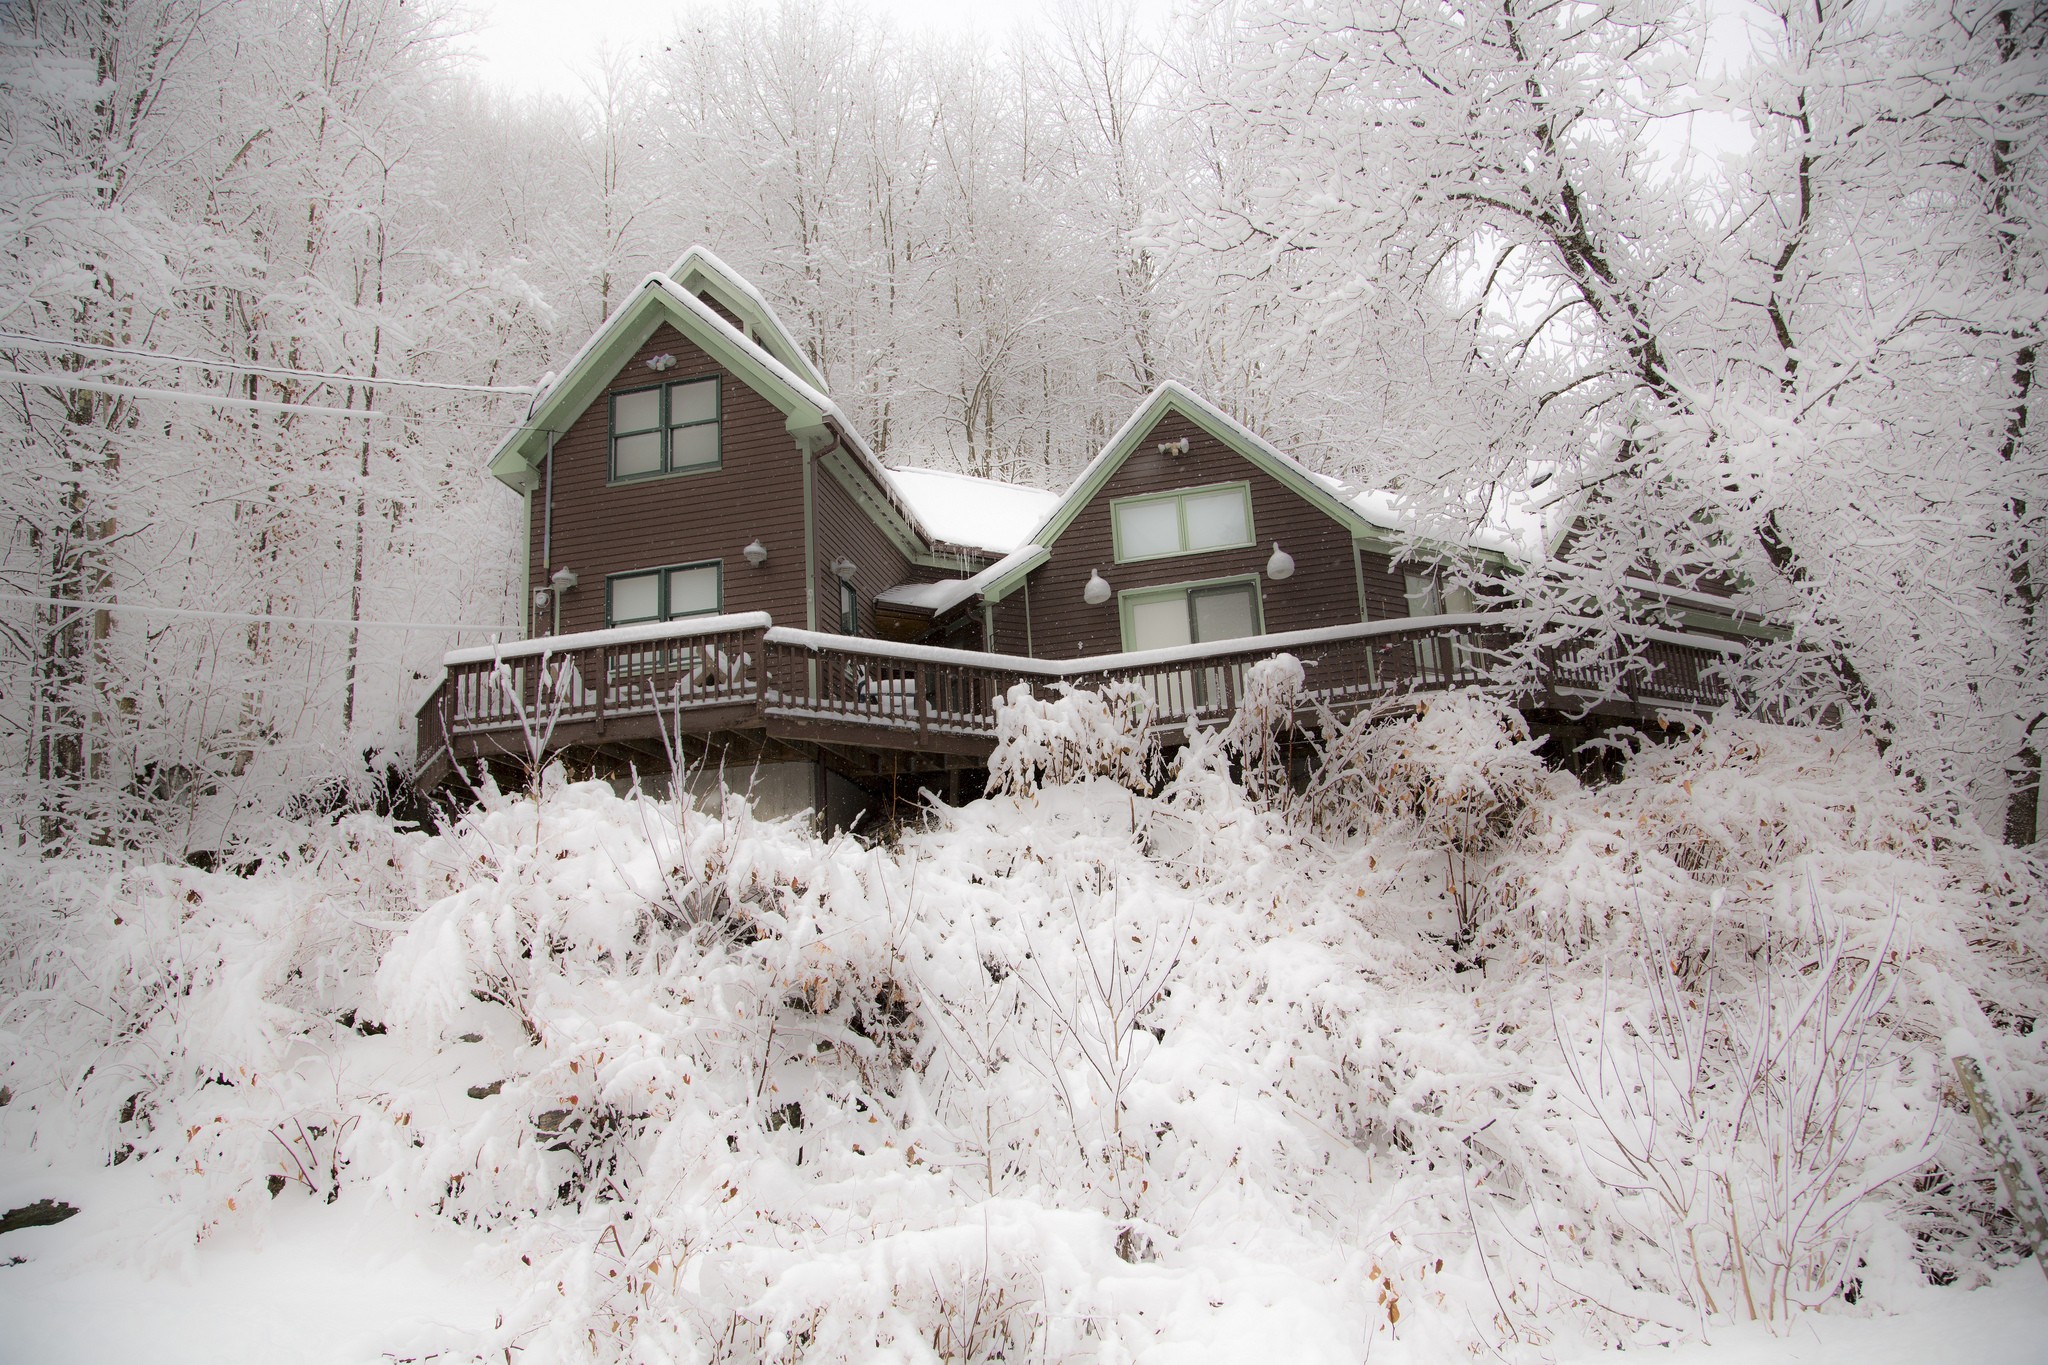 Winter Wonderland by Richard Ricciardi.